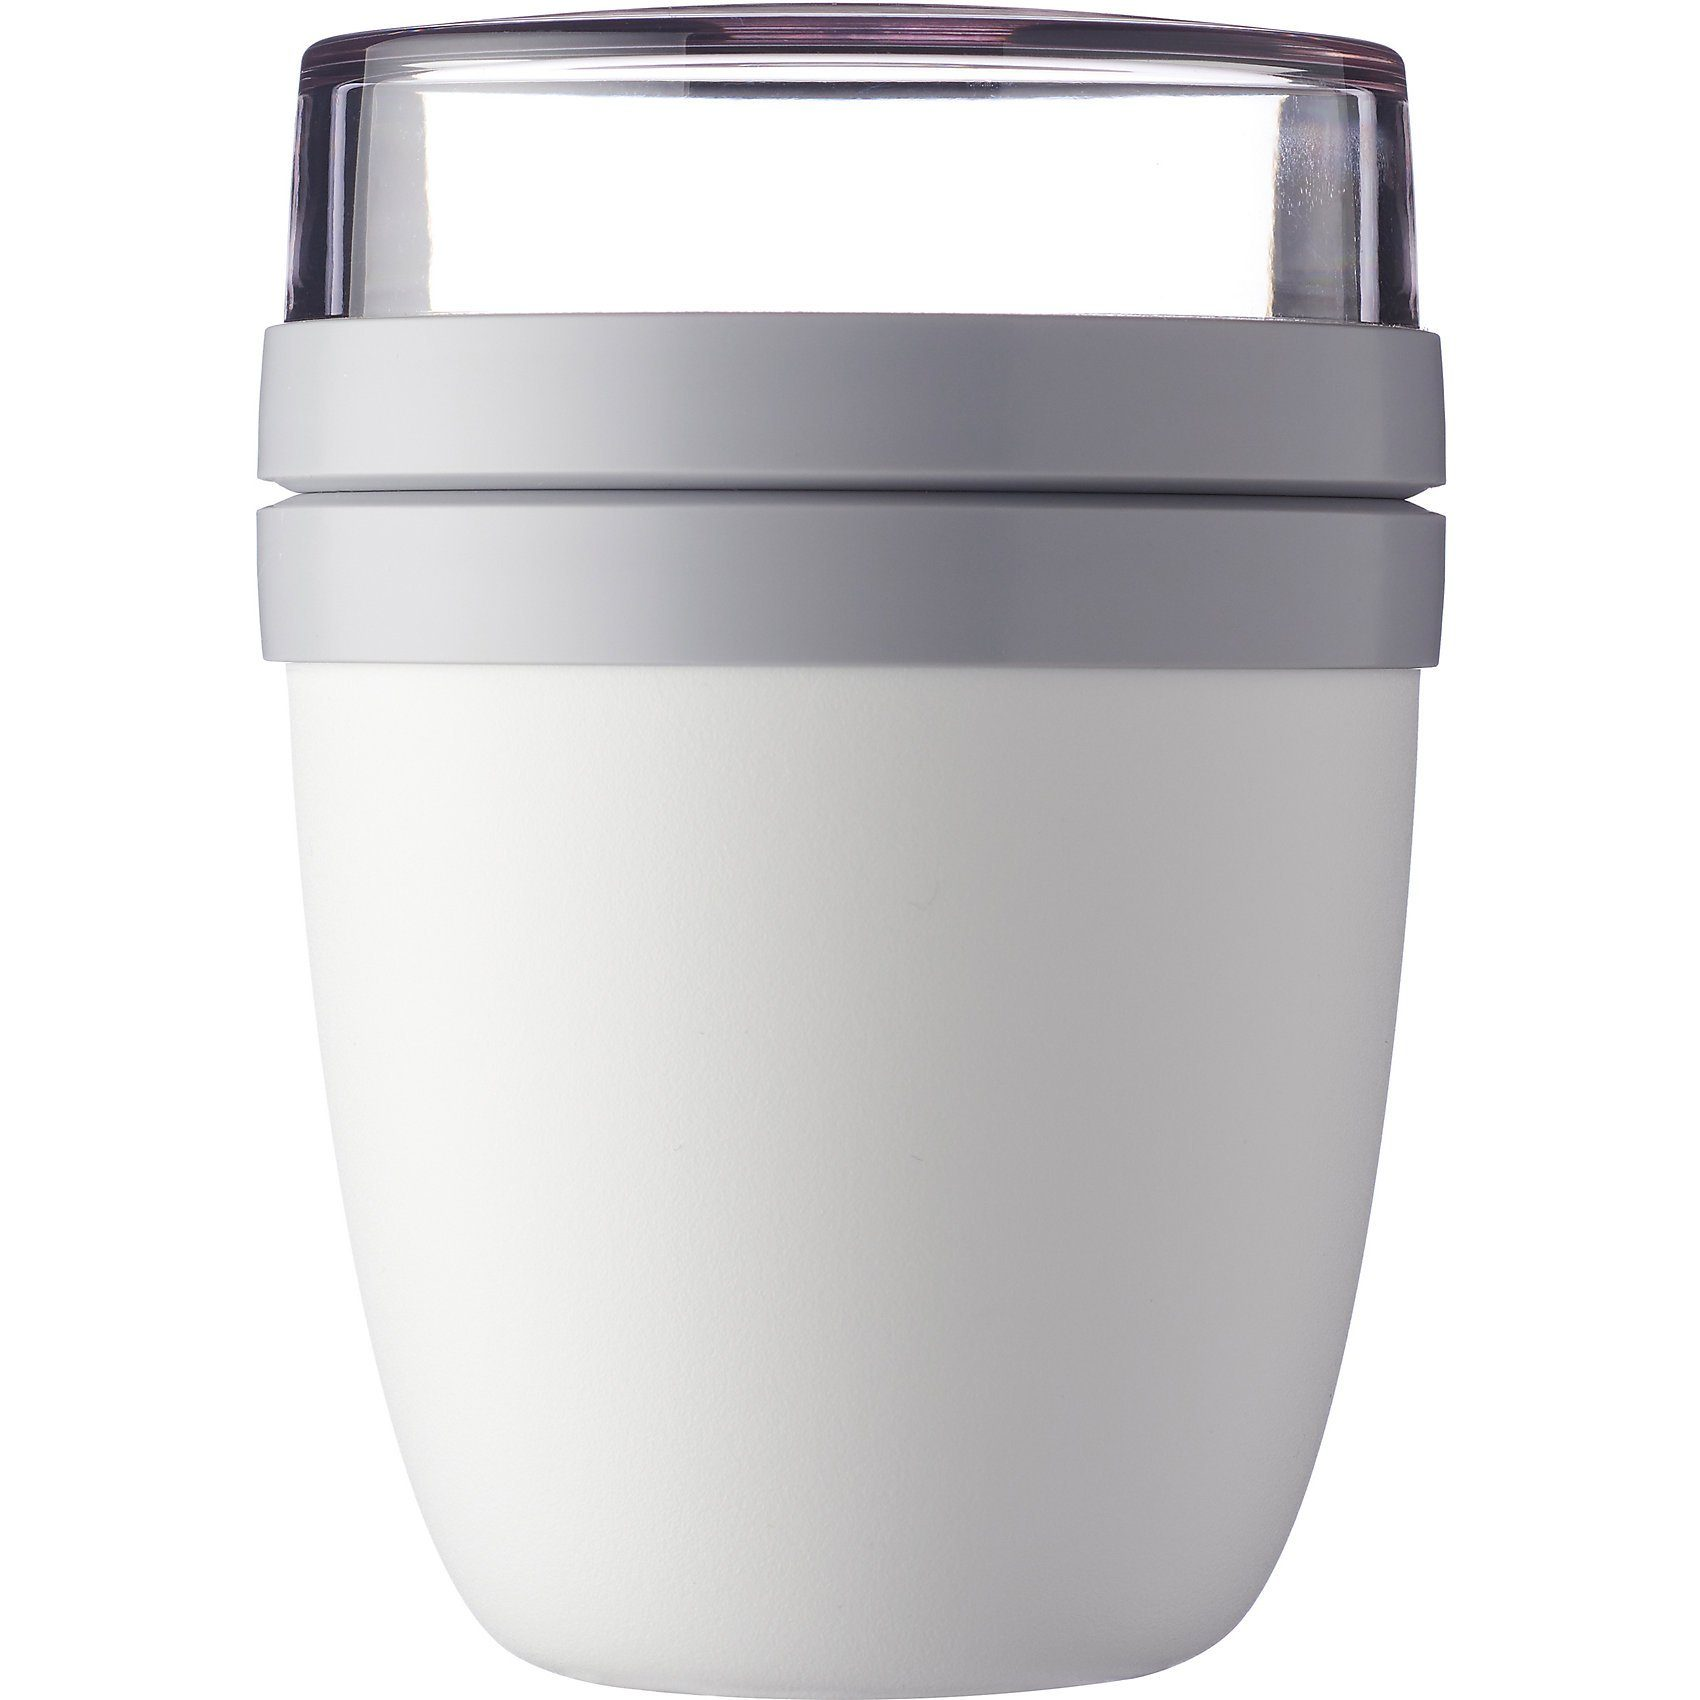 Rosti Mepal Mepal Lunch-Pot ellipse 500 ml + 200 ml, weiß